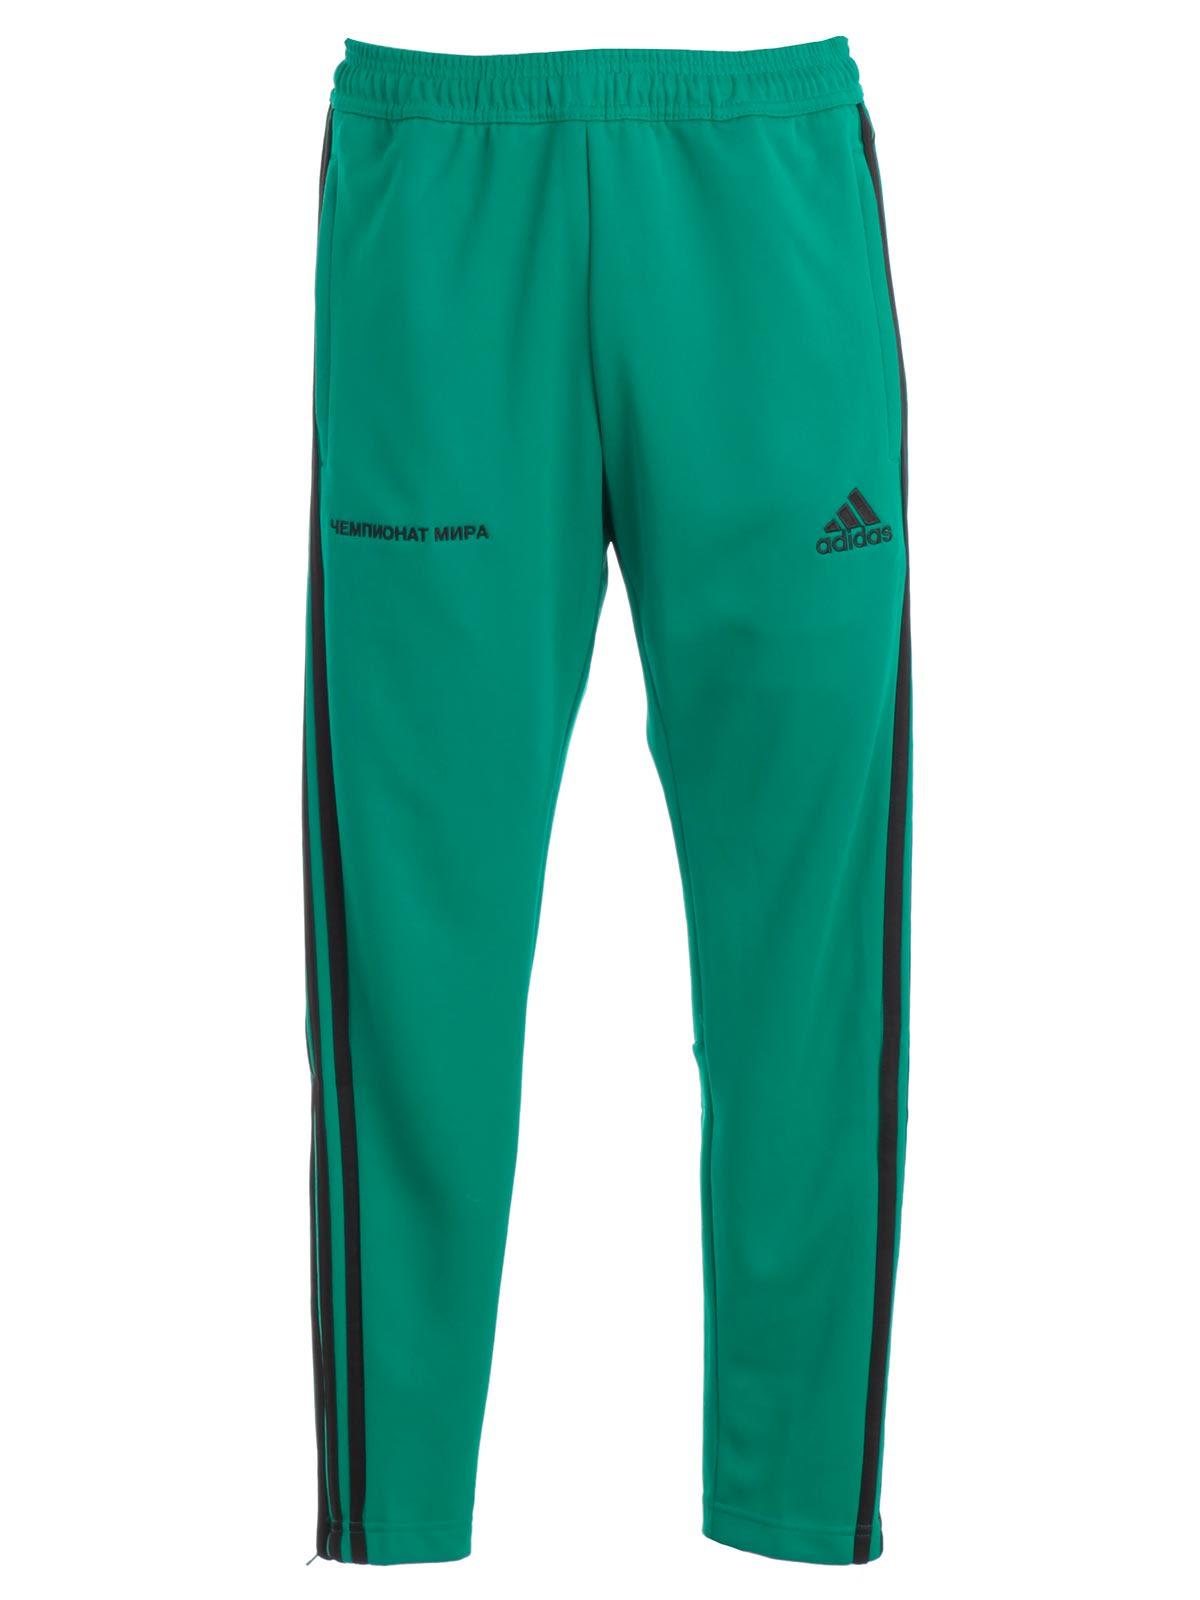 gosha rubchinskiy - Pantalone Adidas Training